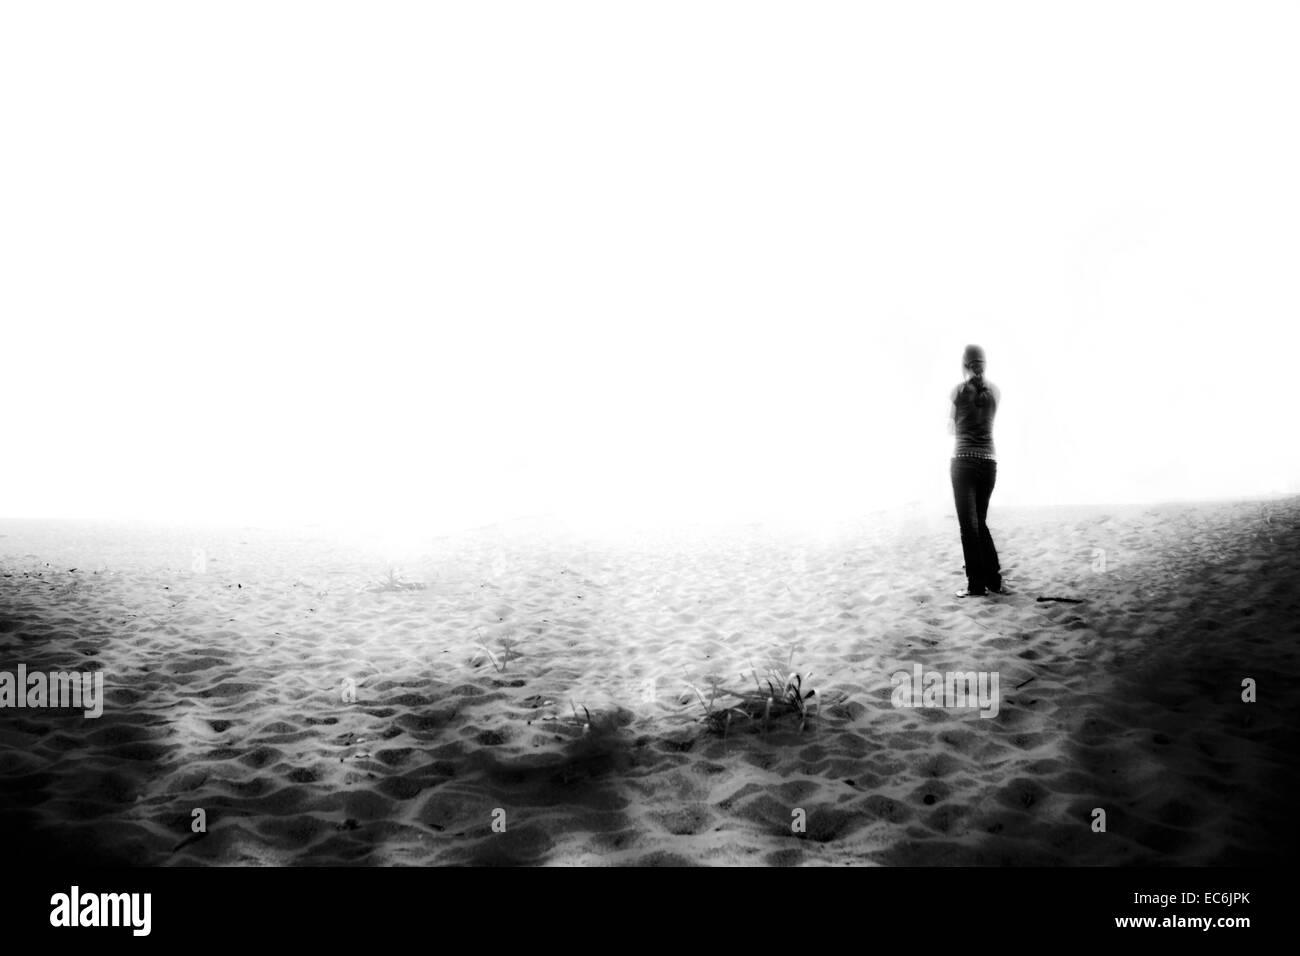 silence - Stock Image